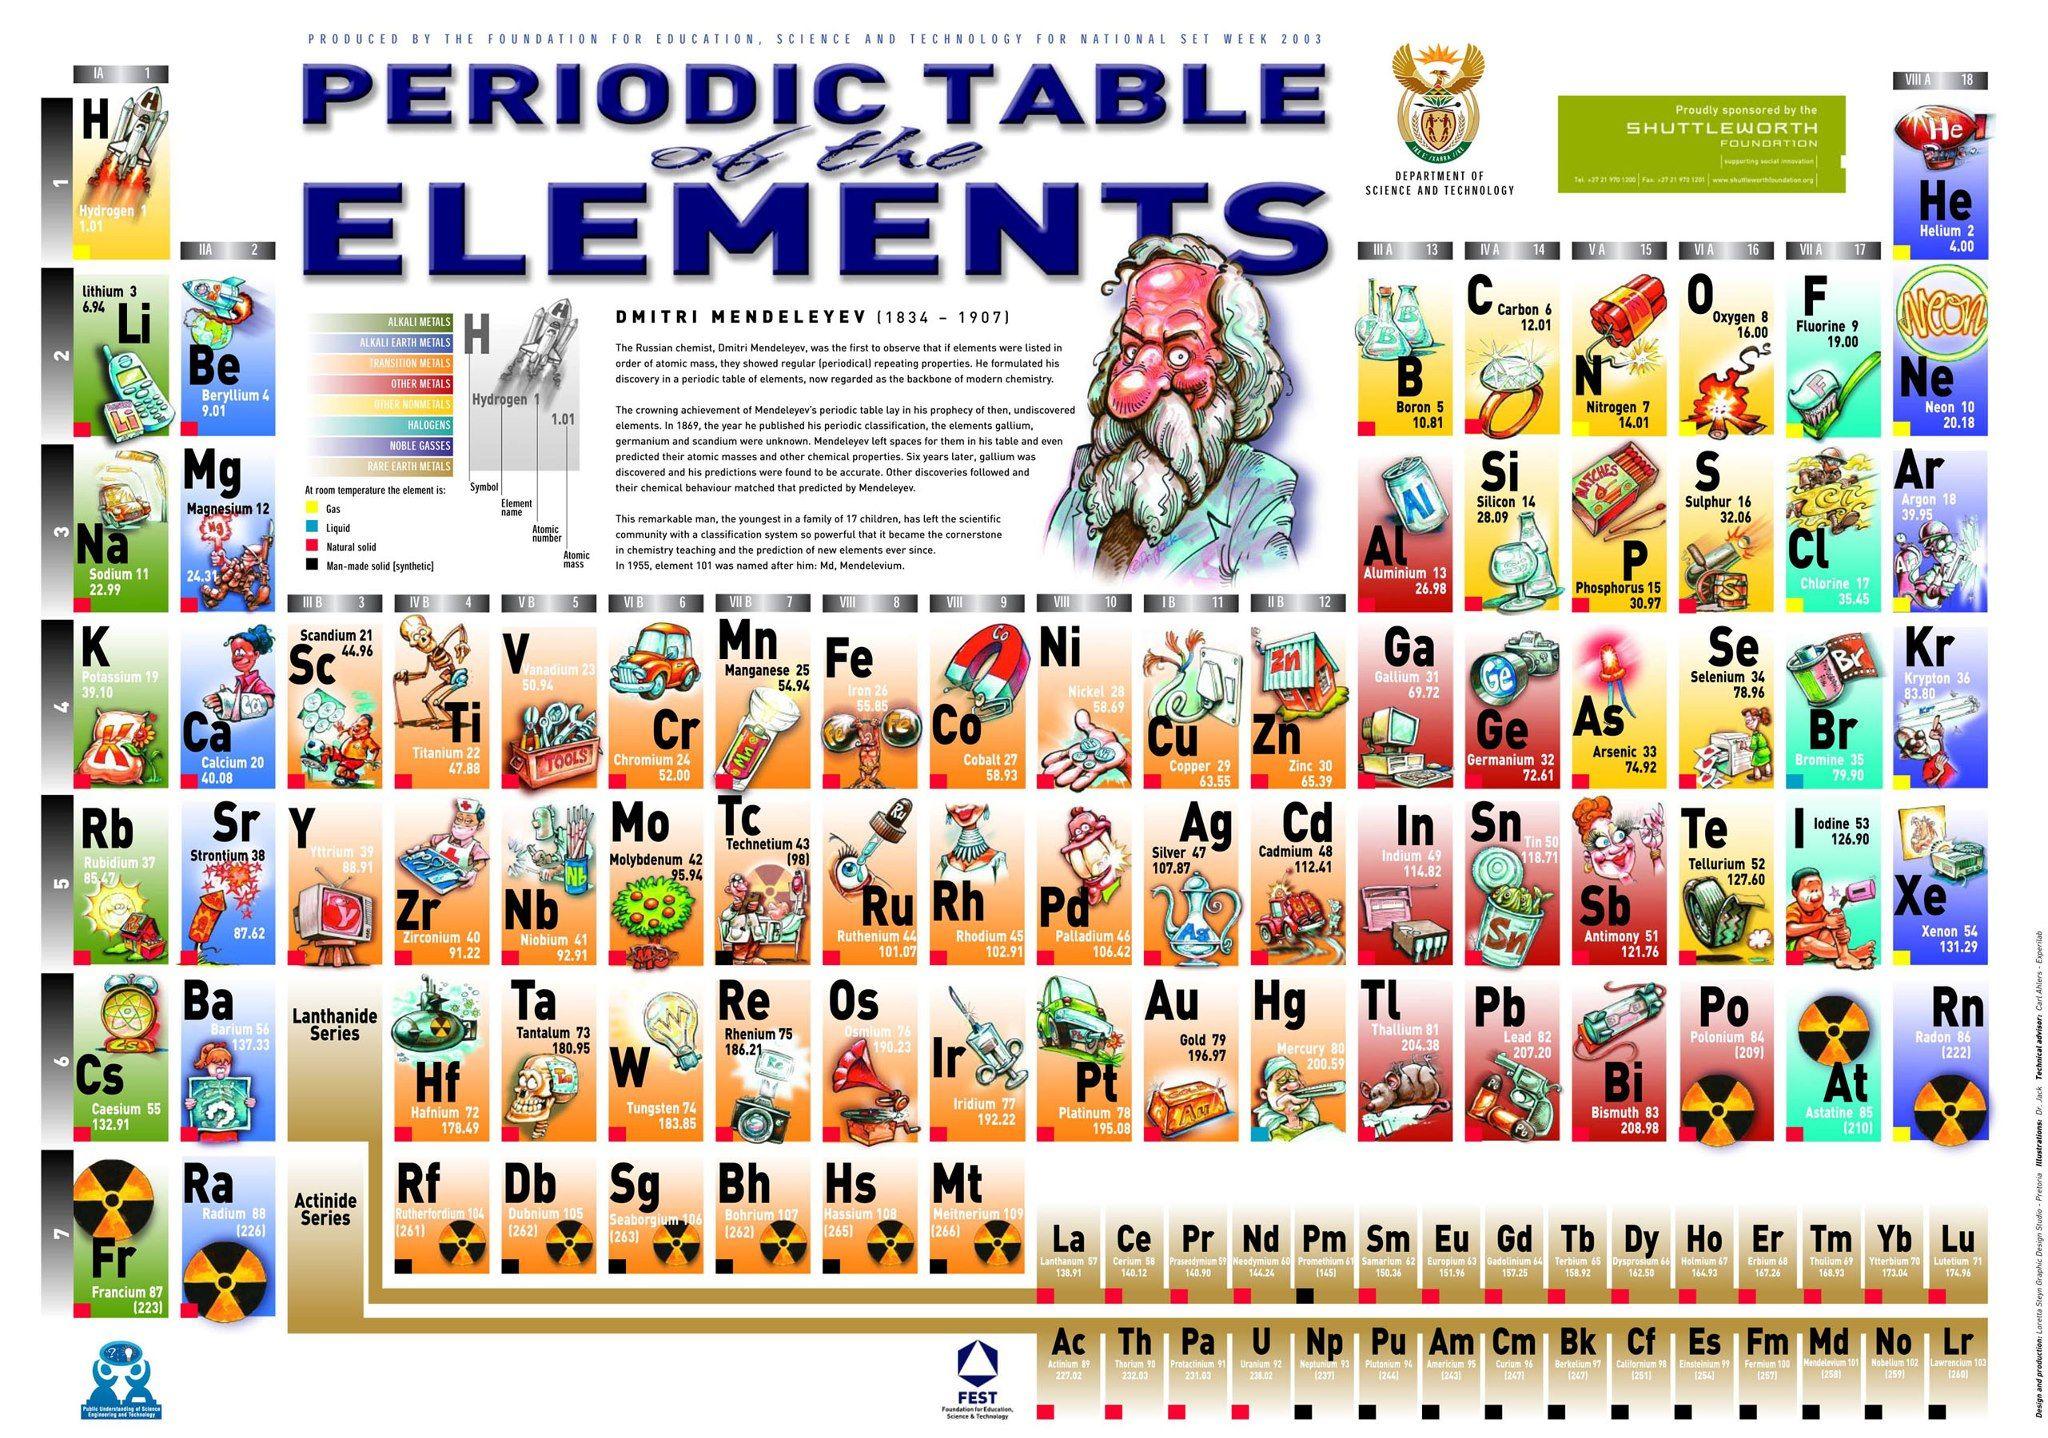 Tabla periodica school stuff pinterest tabla y qumica tabla periodica urtaz Gallery